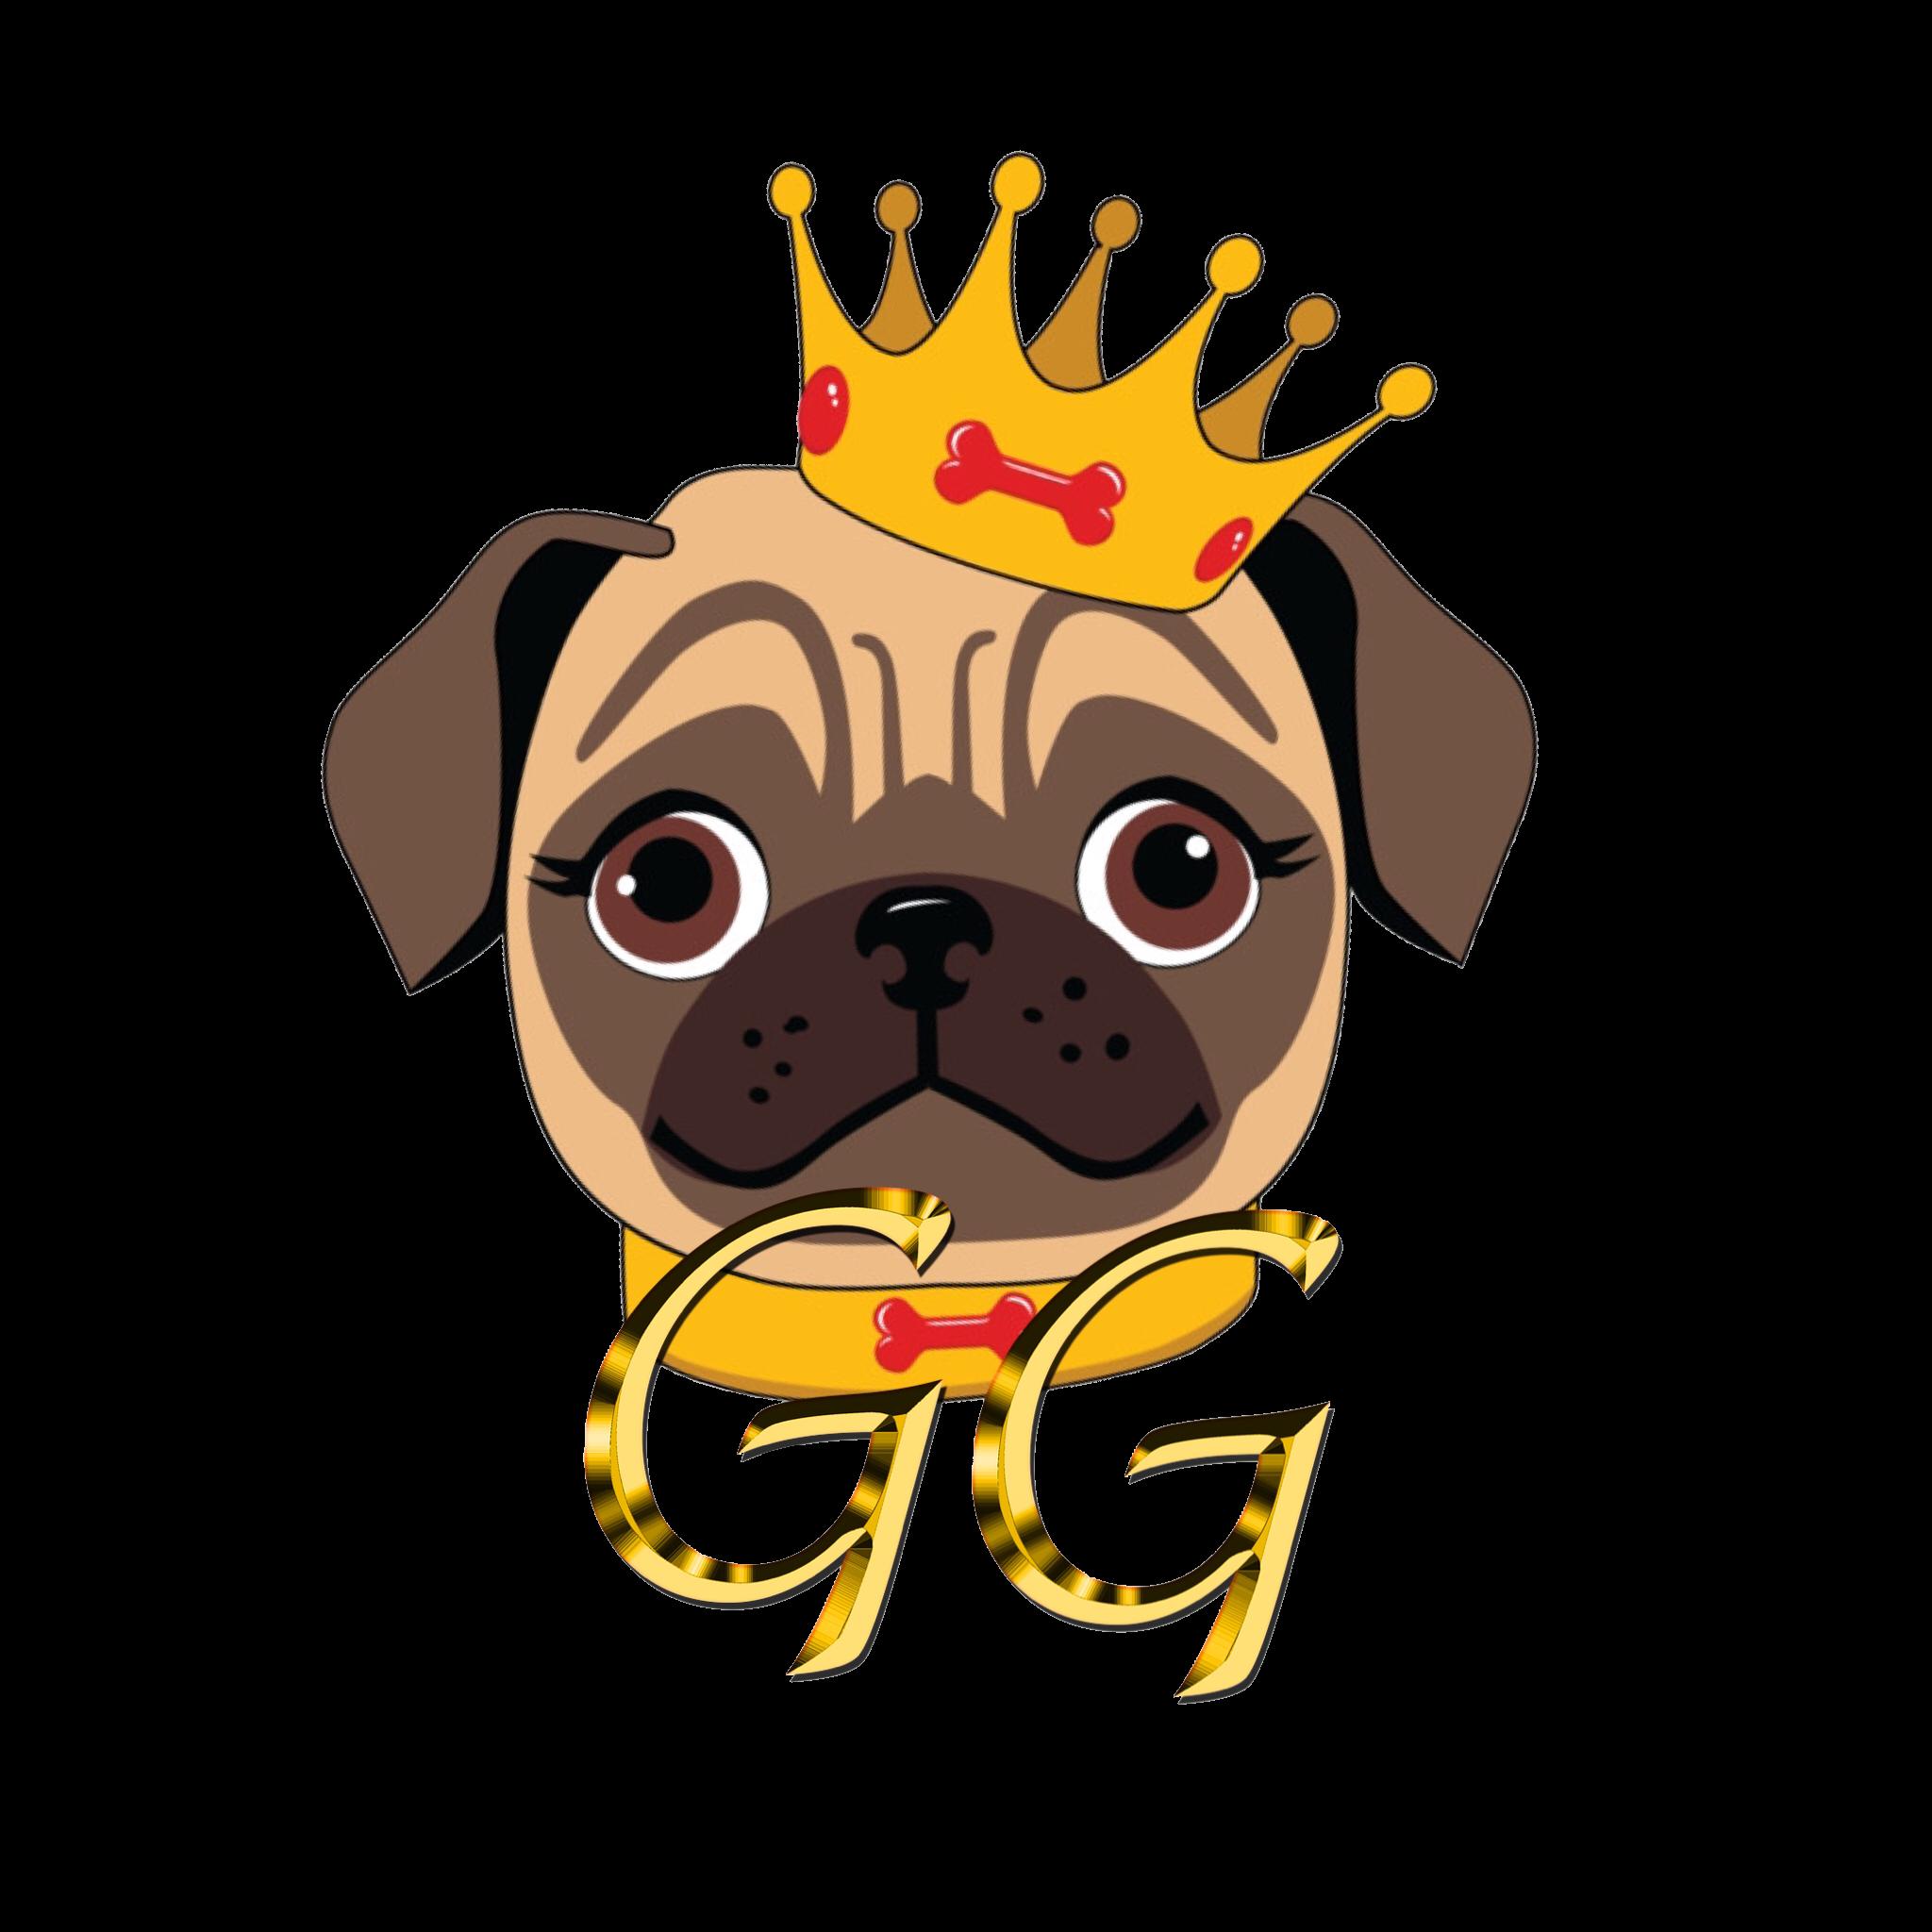 #gg #pugs #emoji   Cartoon, Twitch, Pugs